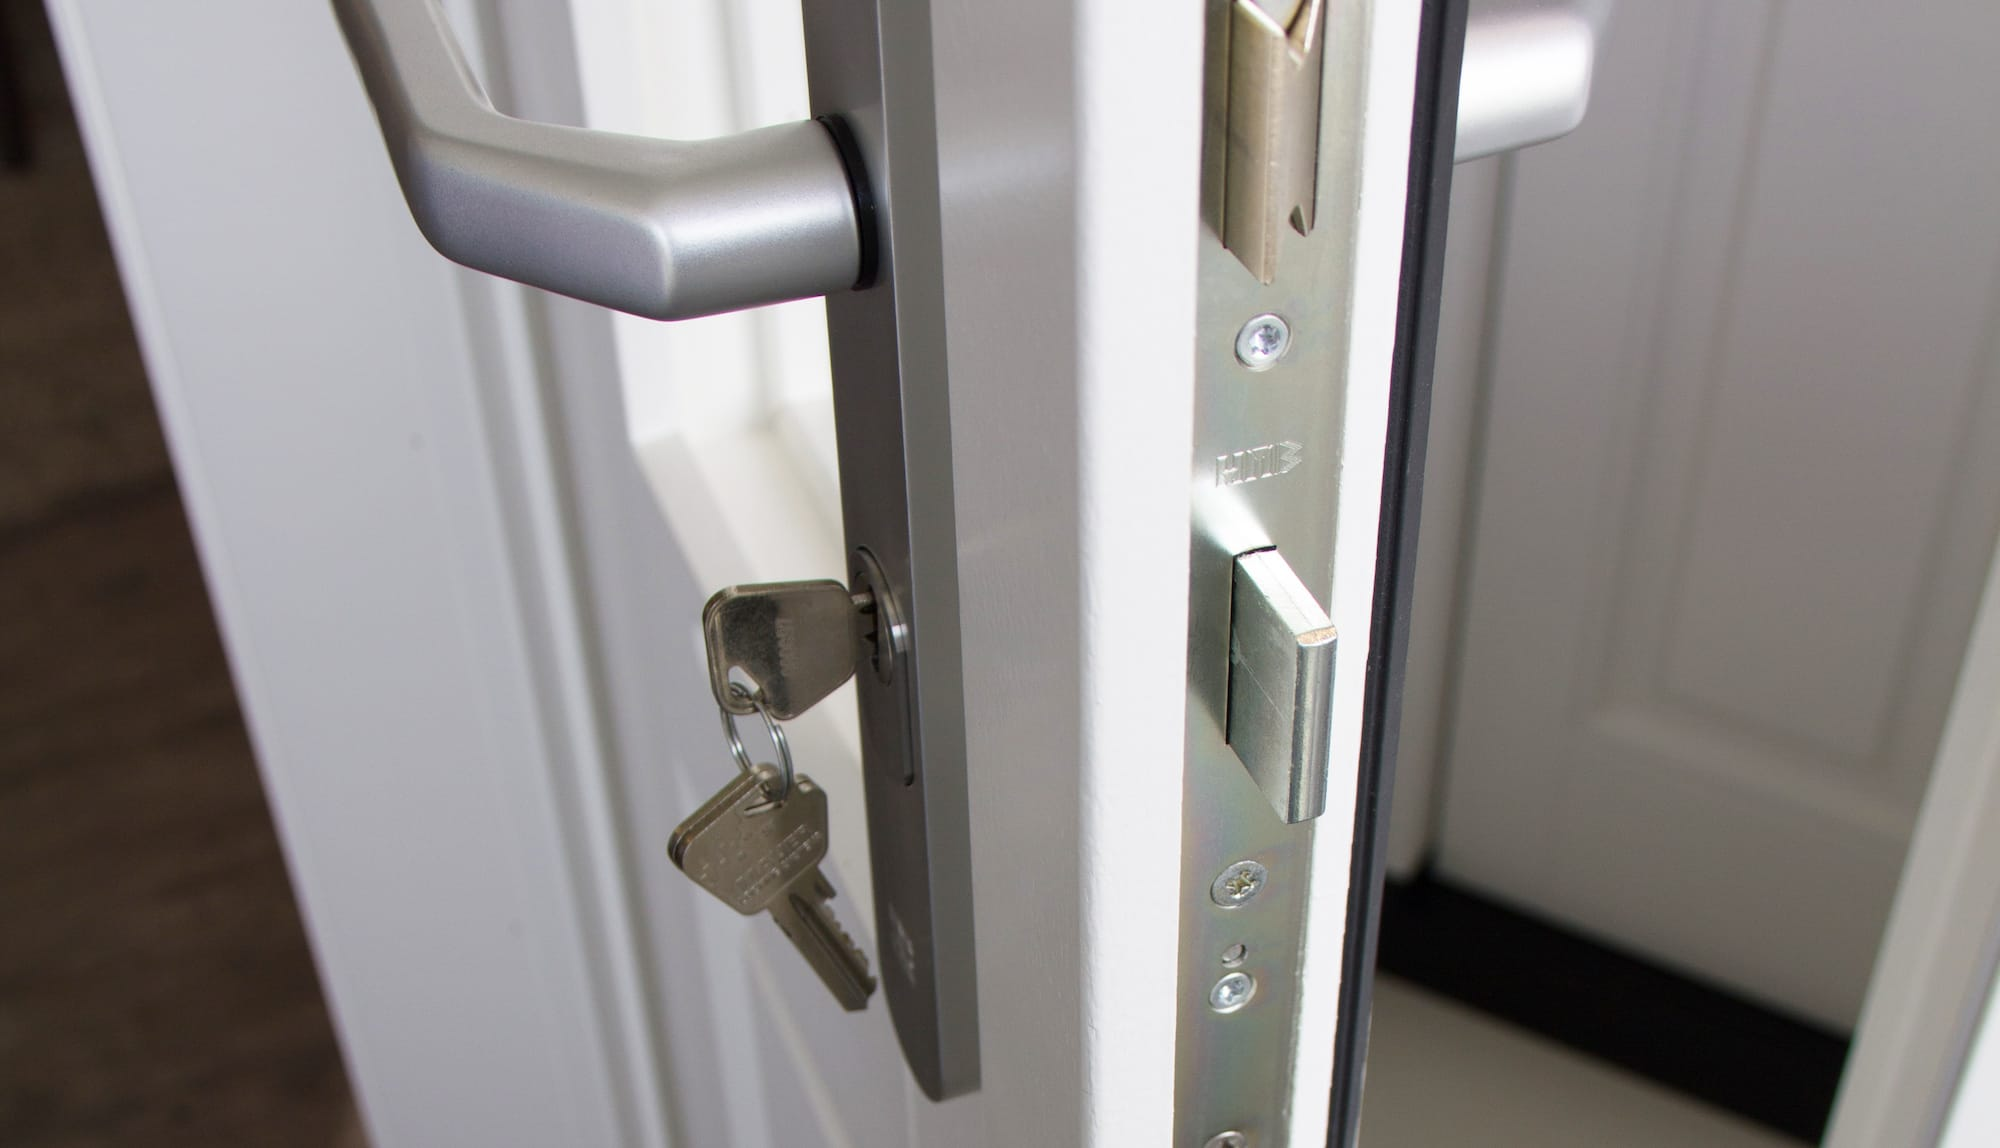 HMB Multi-point lock